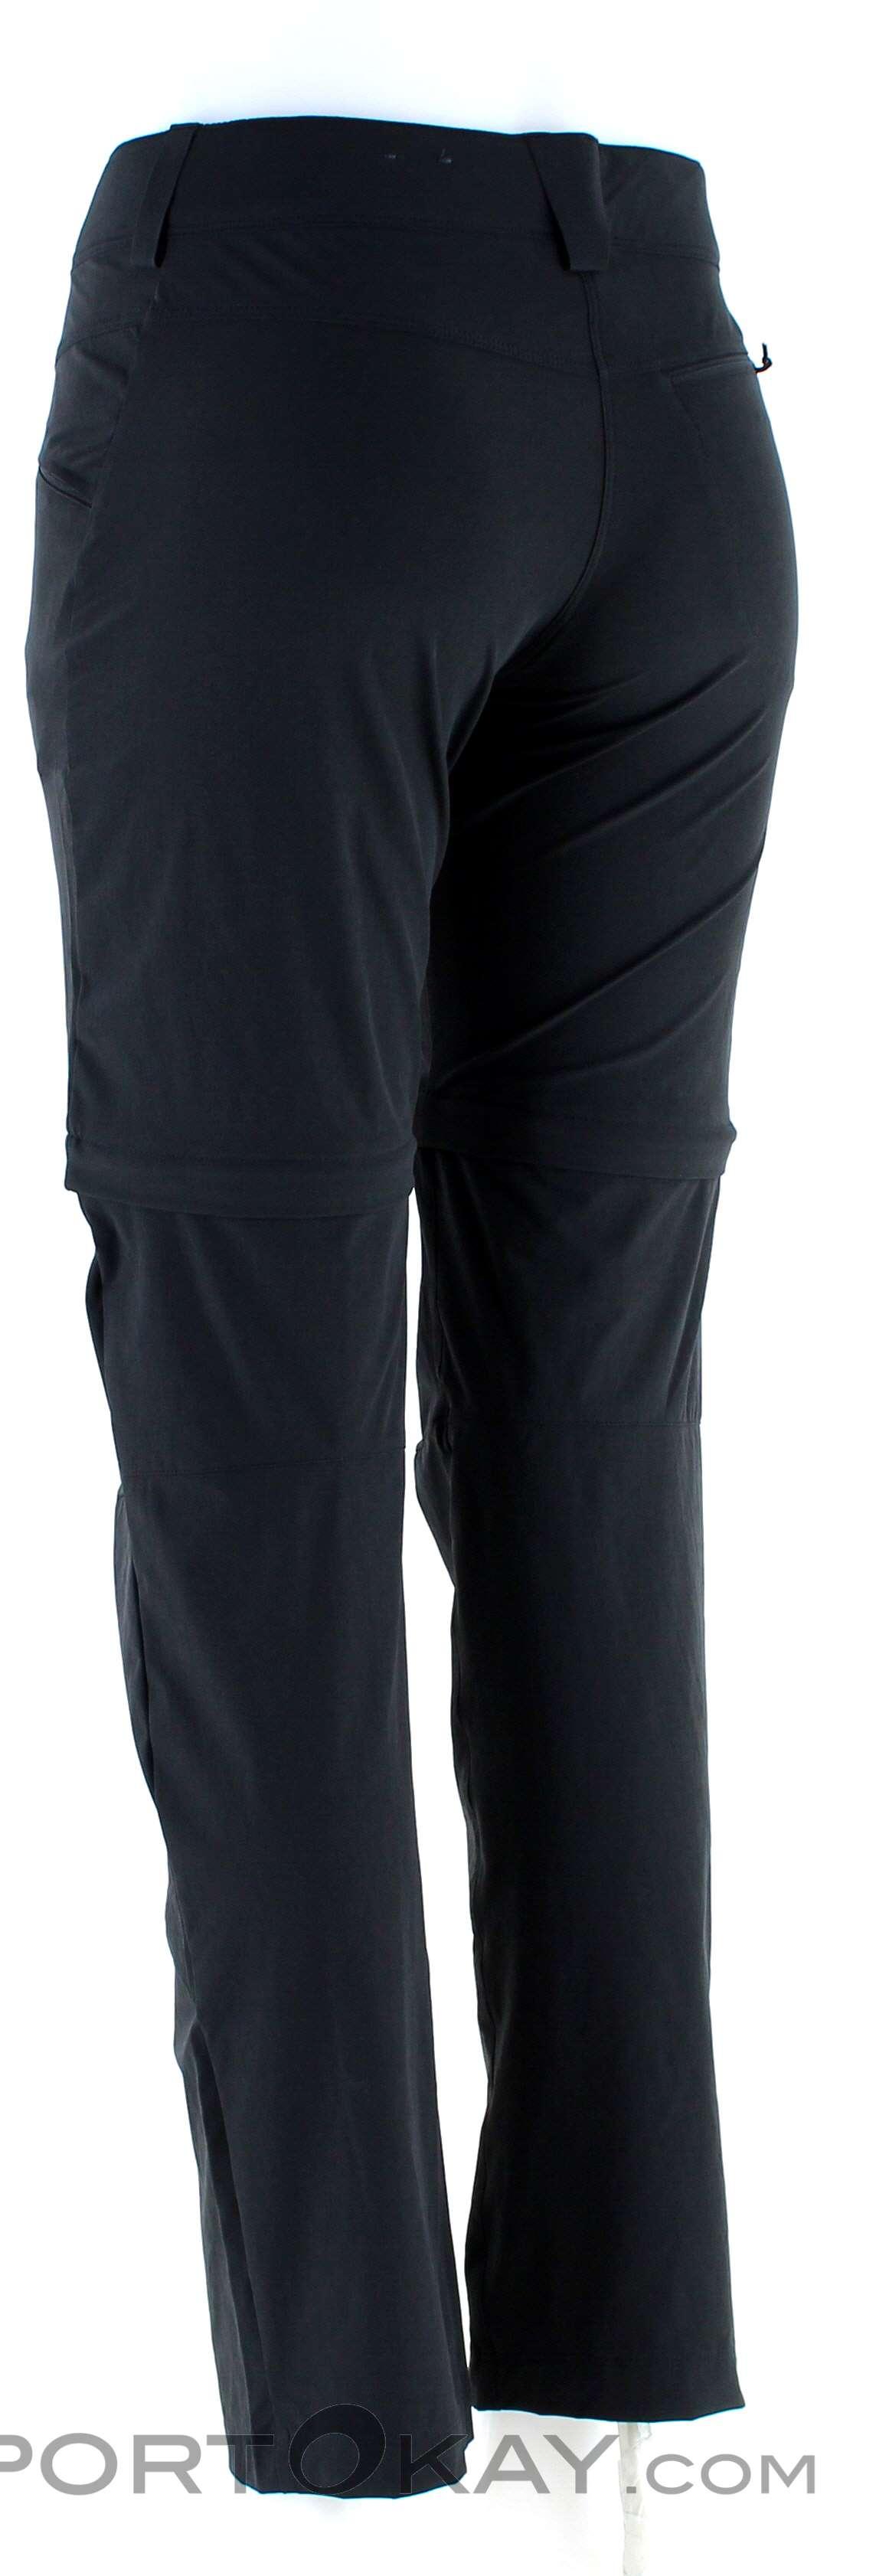 Zip Wayfarer Womens Pants Straight Salomon Pan Outdoor yv0N8nmwO